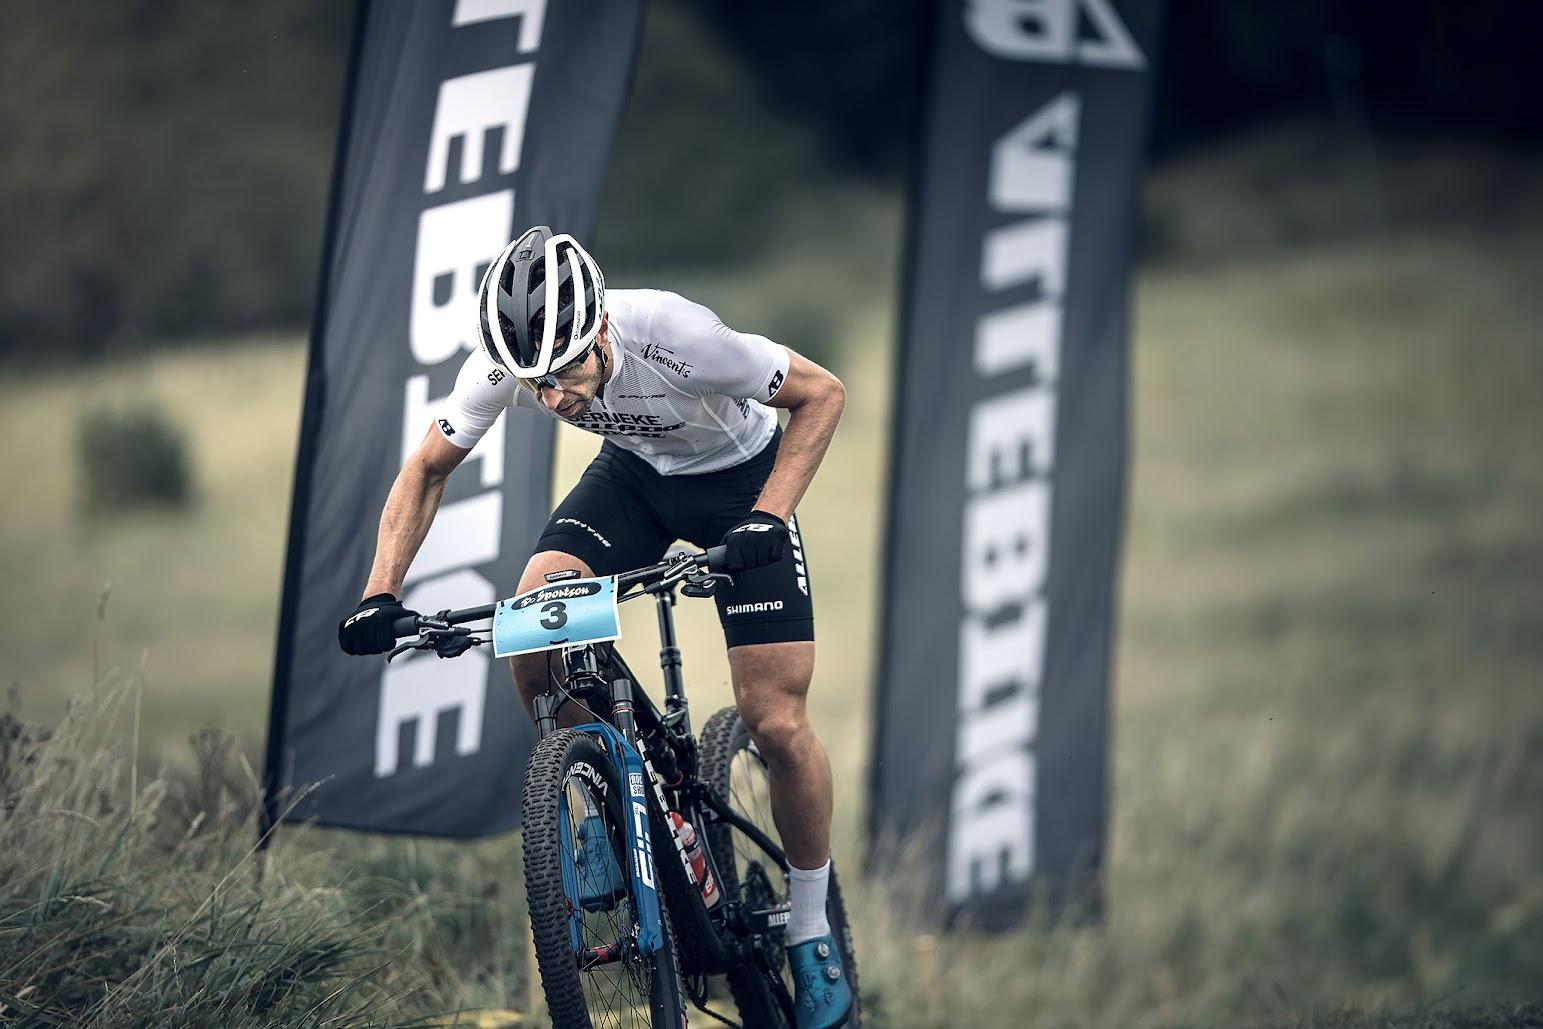 Dubbla segrar i Mountainbike SM för Team Allebike Serneke